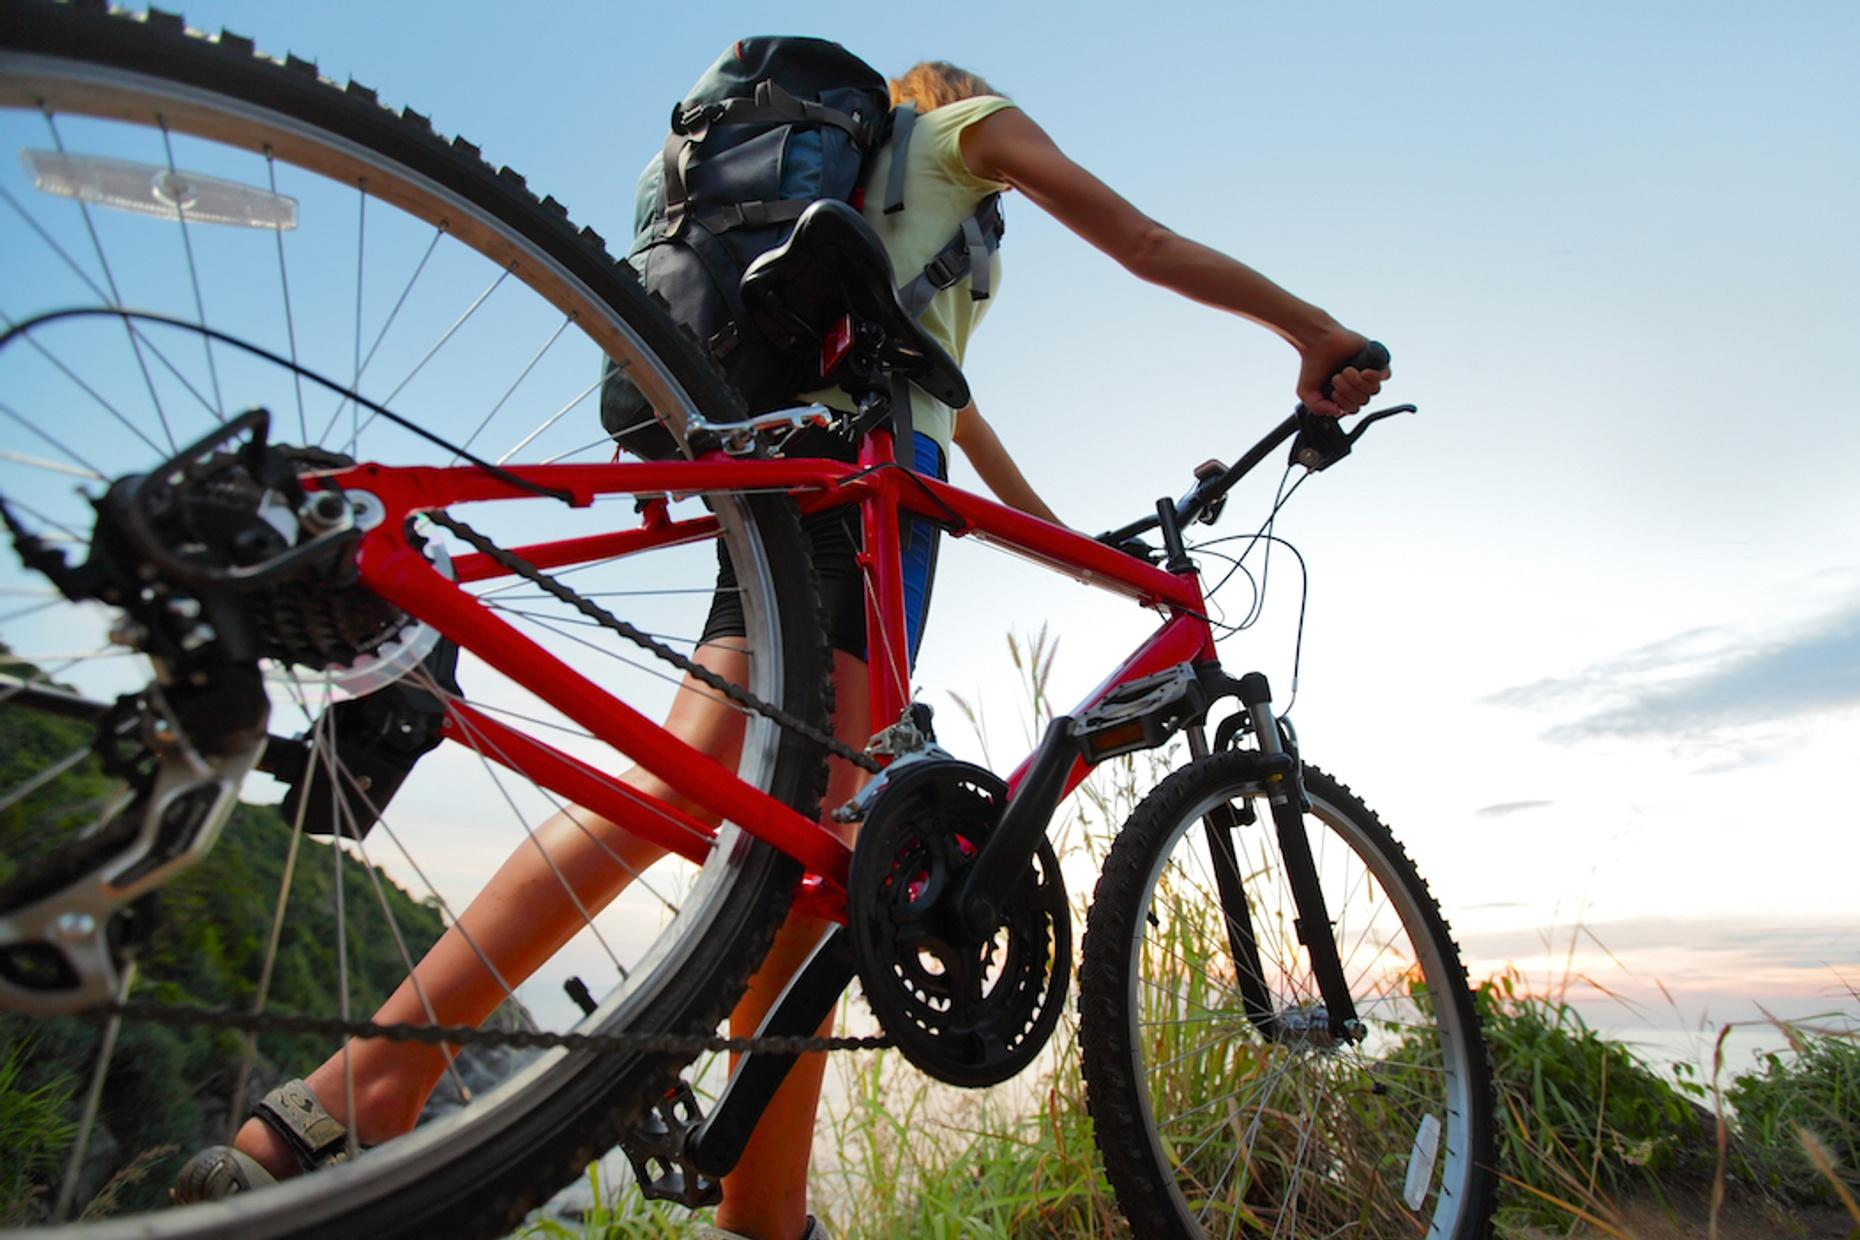 Lost City Mountain Biking Adventure in Cancun